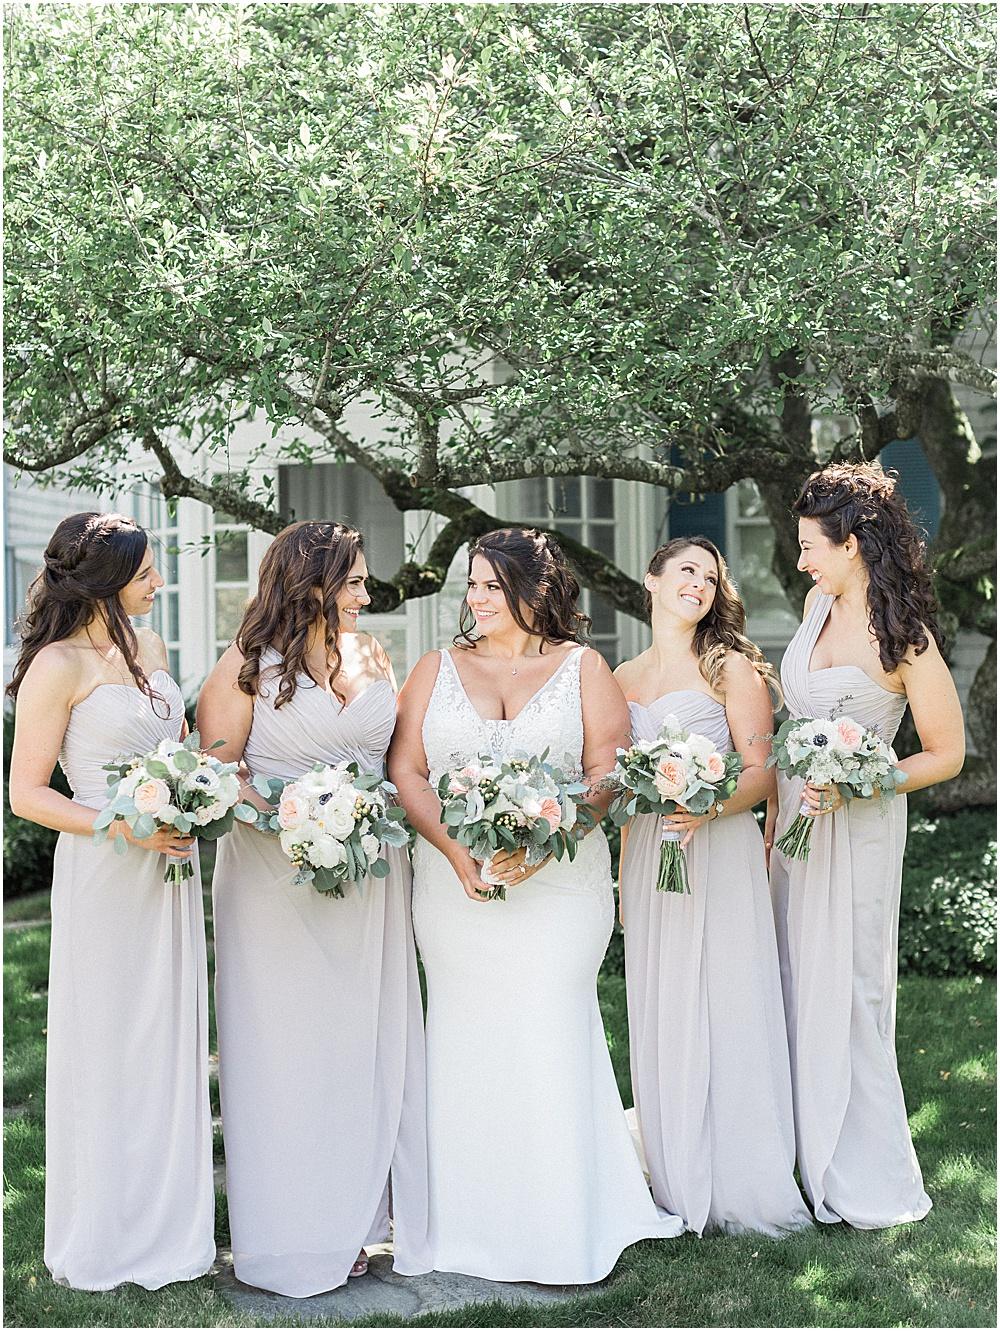 tabor_academy_rebecca_chris_tented_interior_trees_engagement_session_cape_cod_massachusetts_boston_wedding_photographer_meredith_jane_photography_photo_0704.jpg